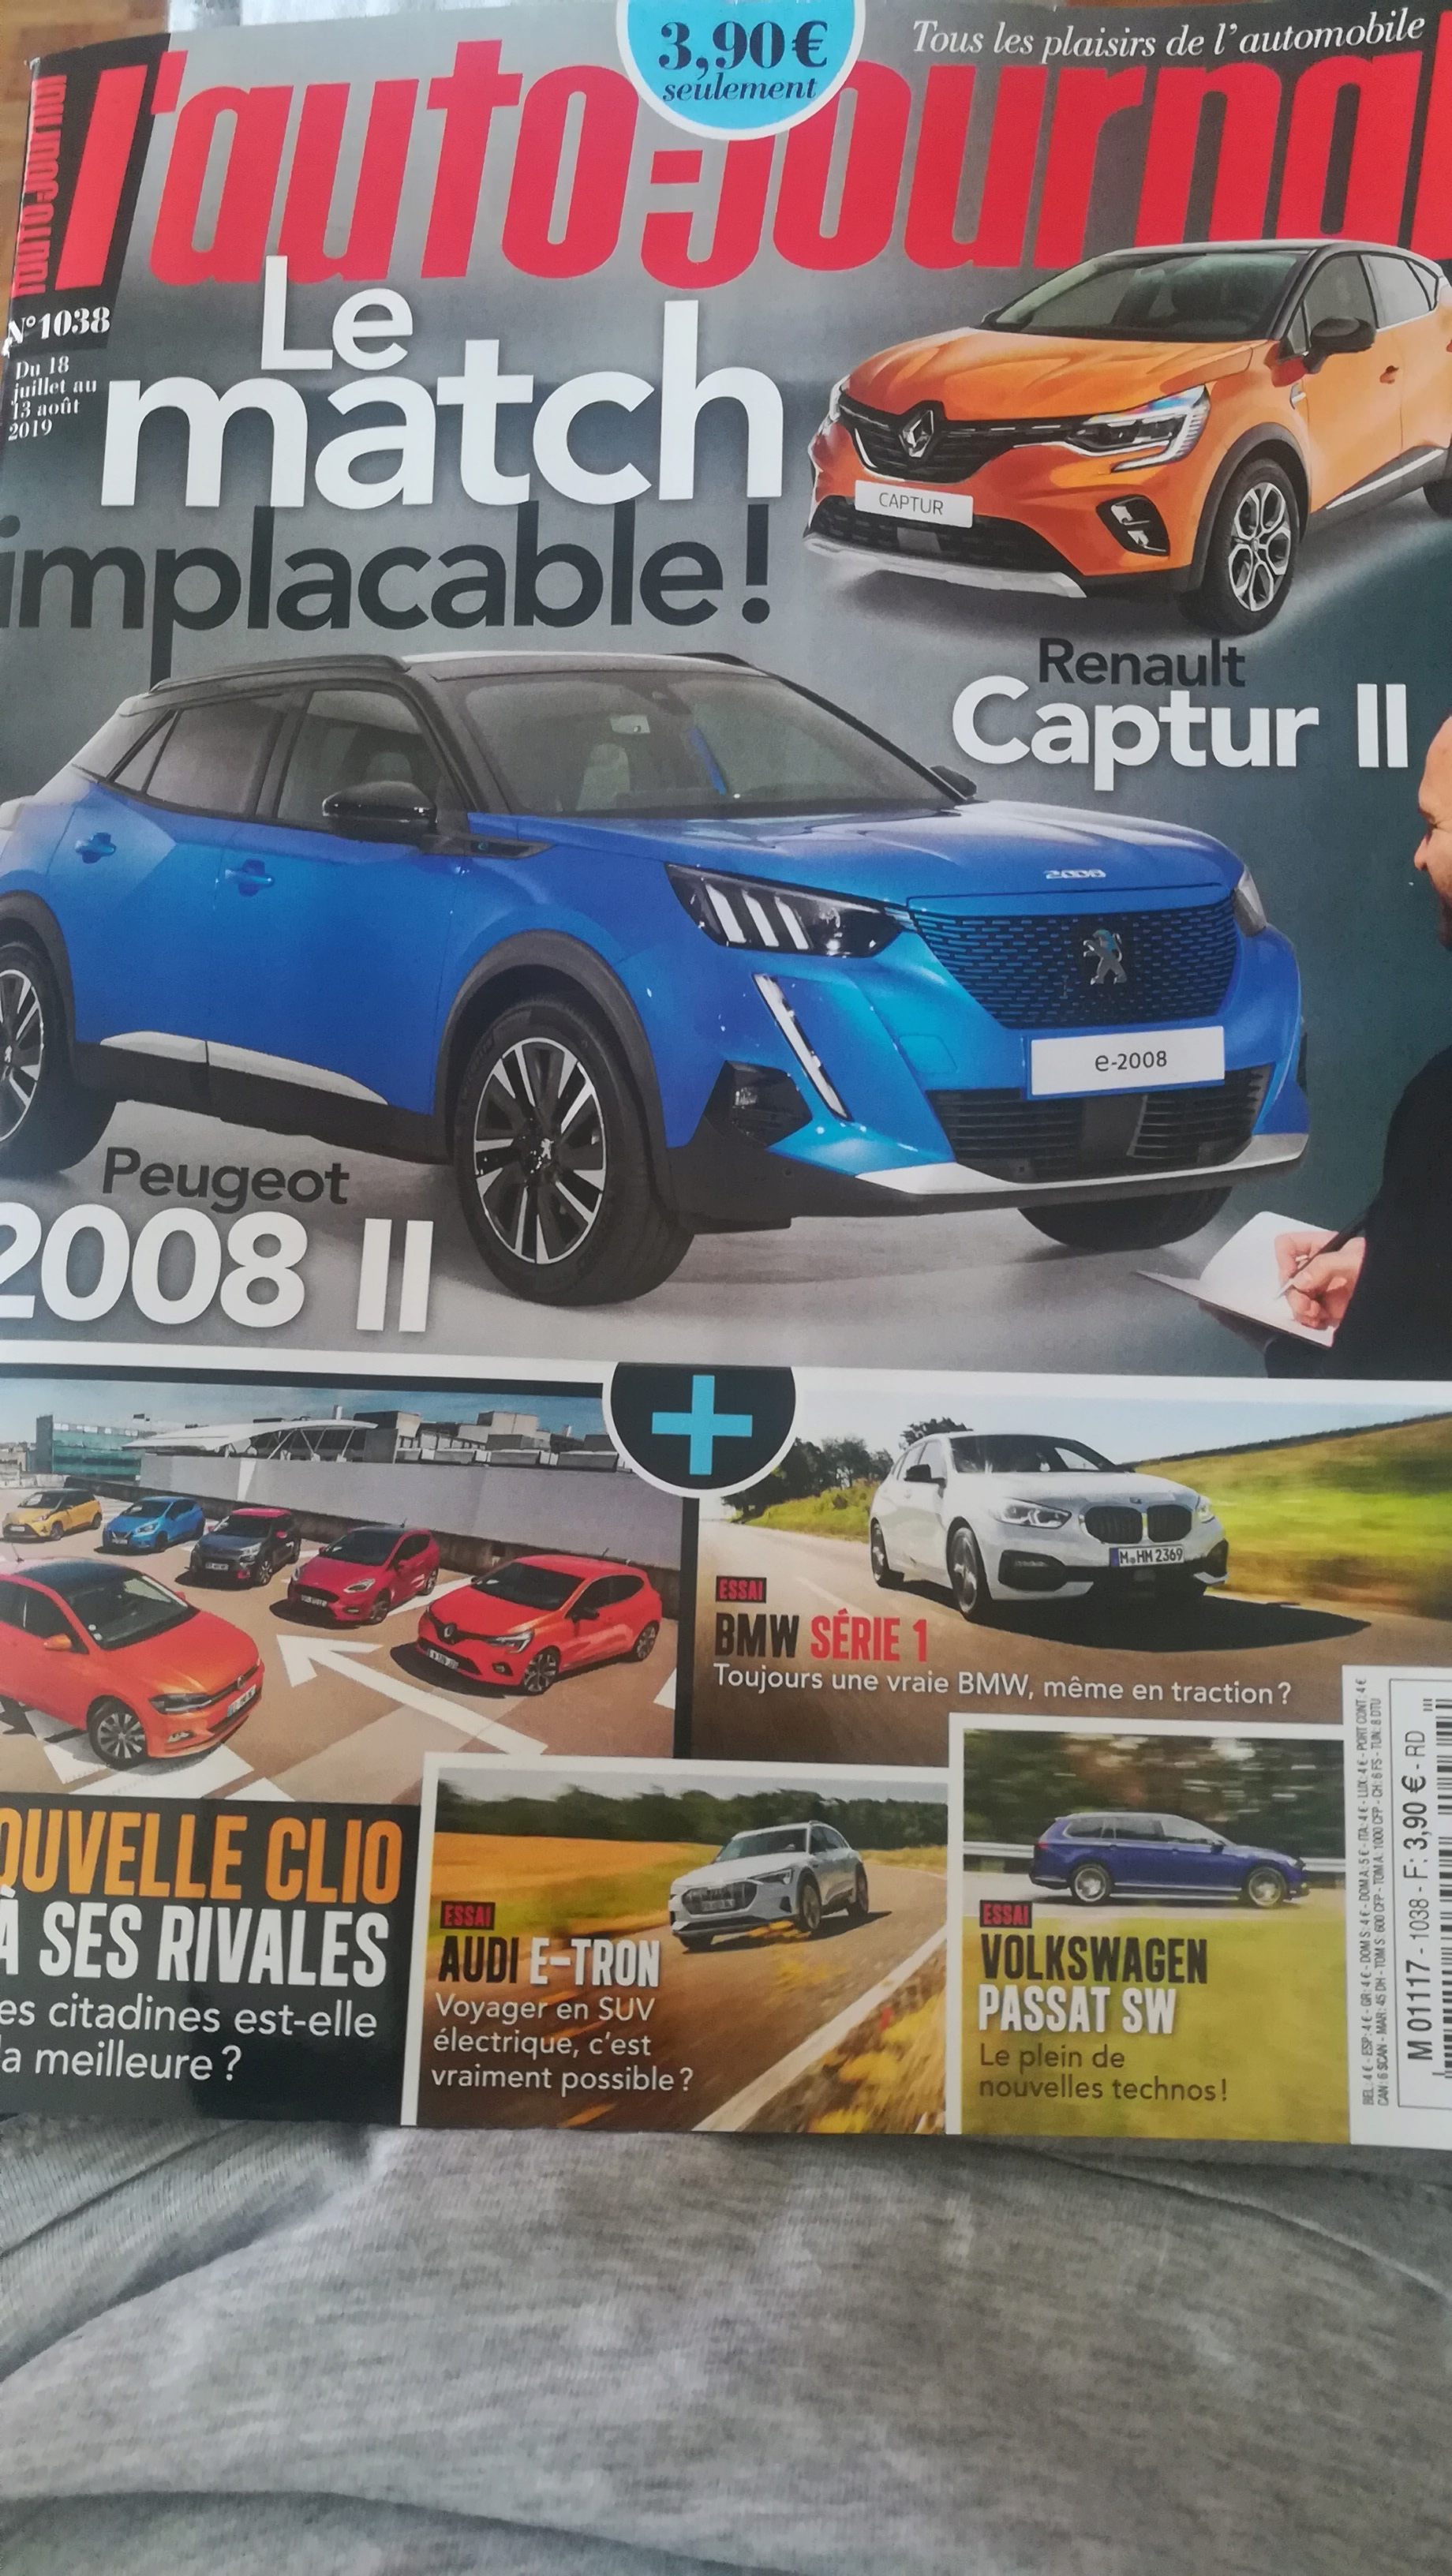 [Presse] Les magazines auto ! - Page 21 Img_2129